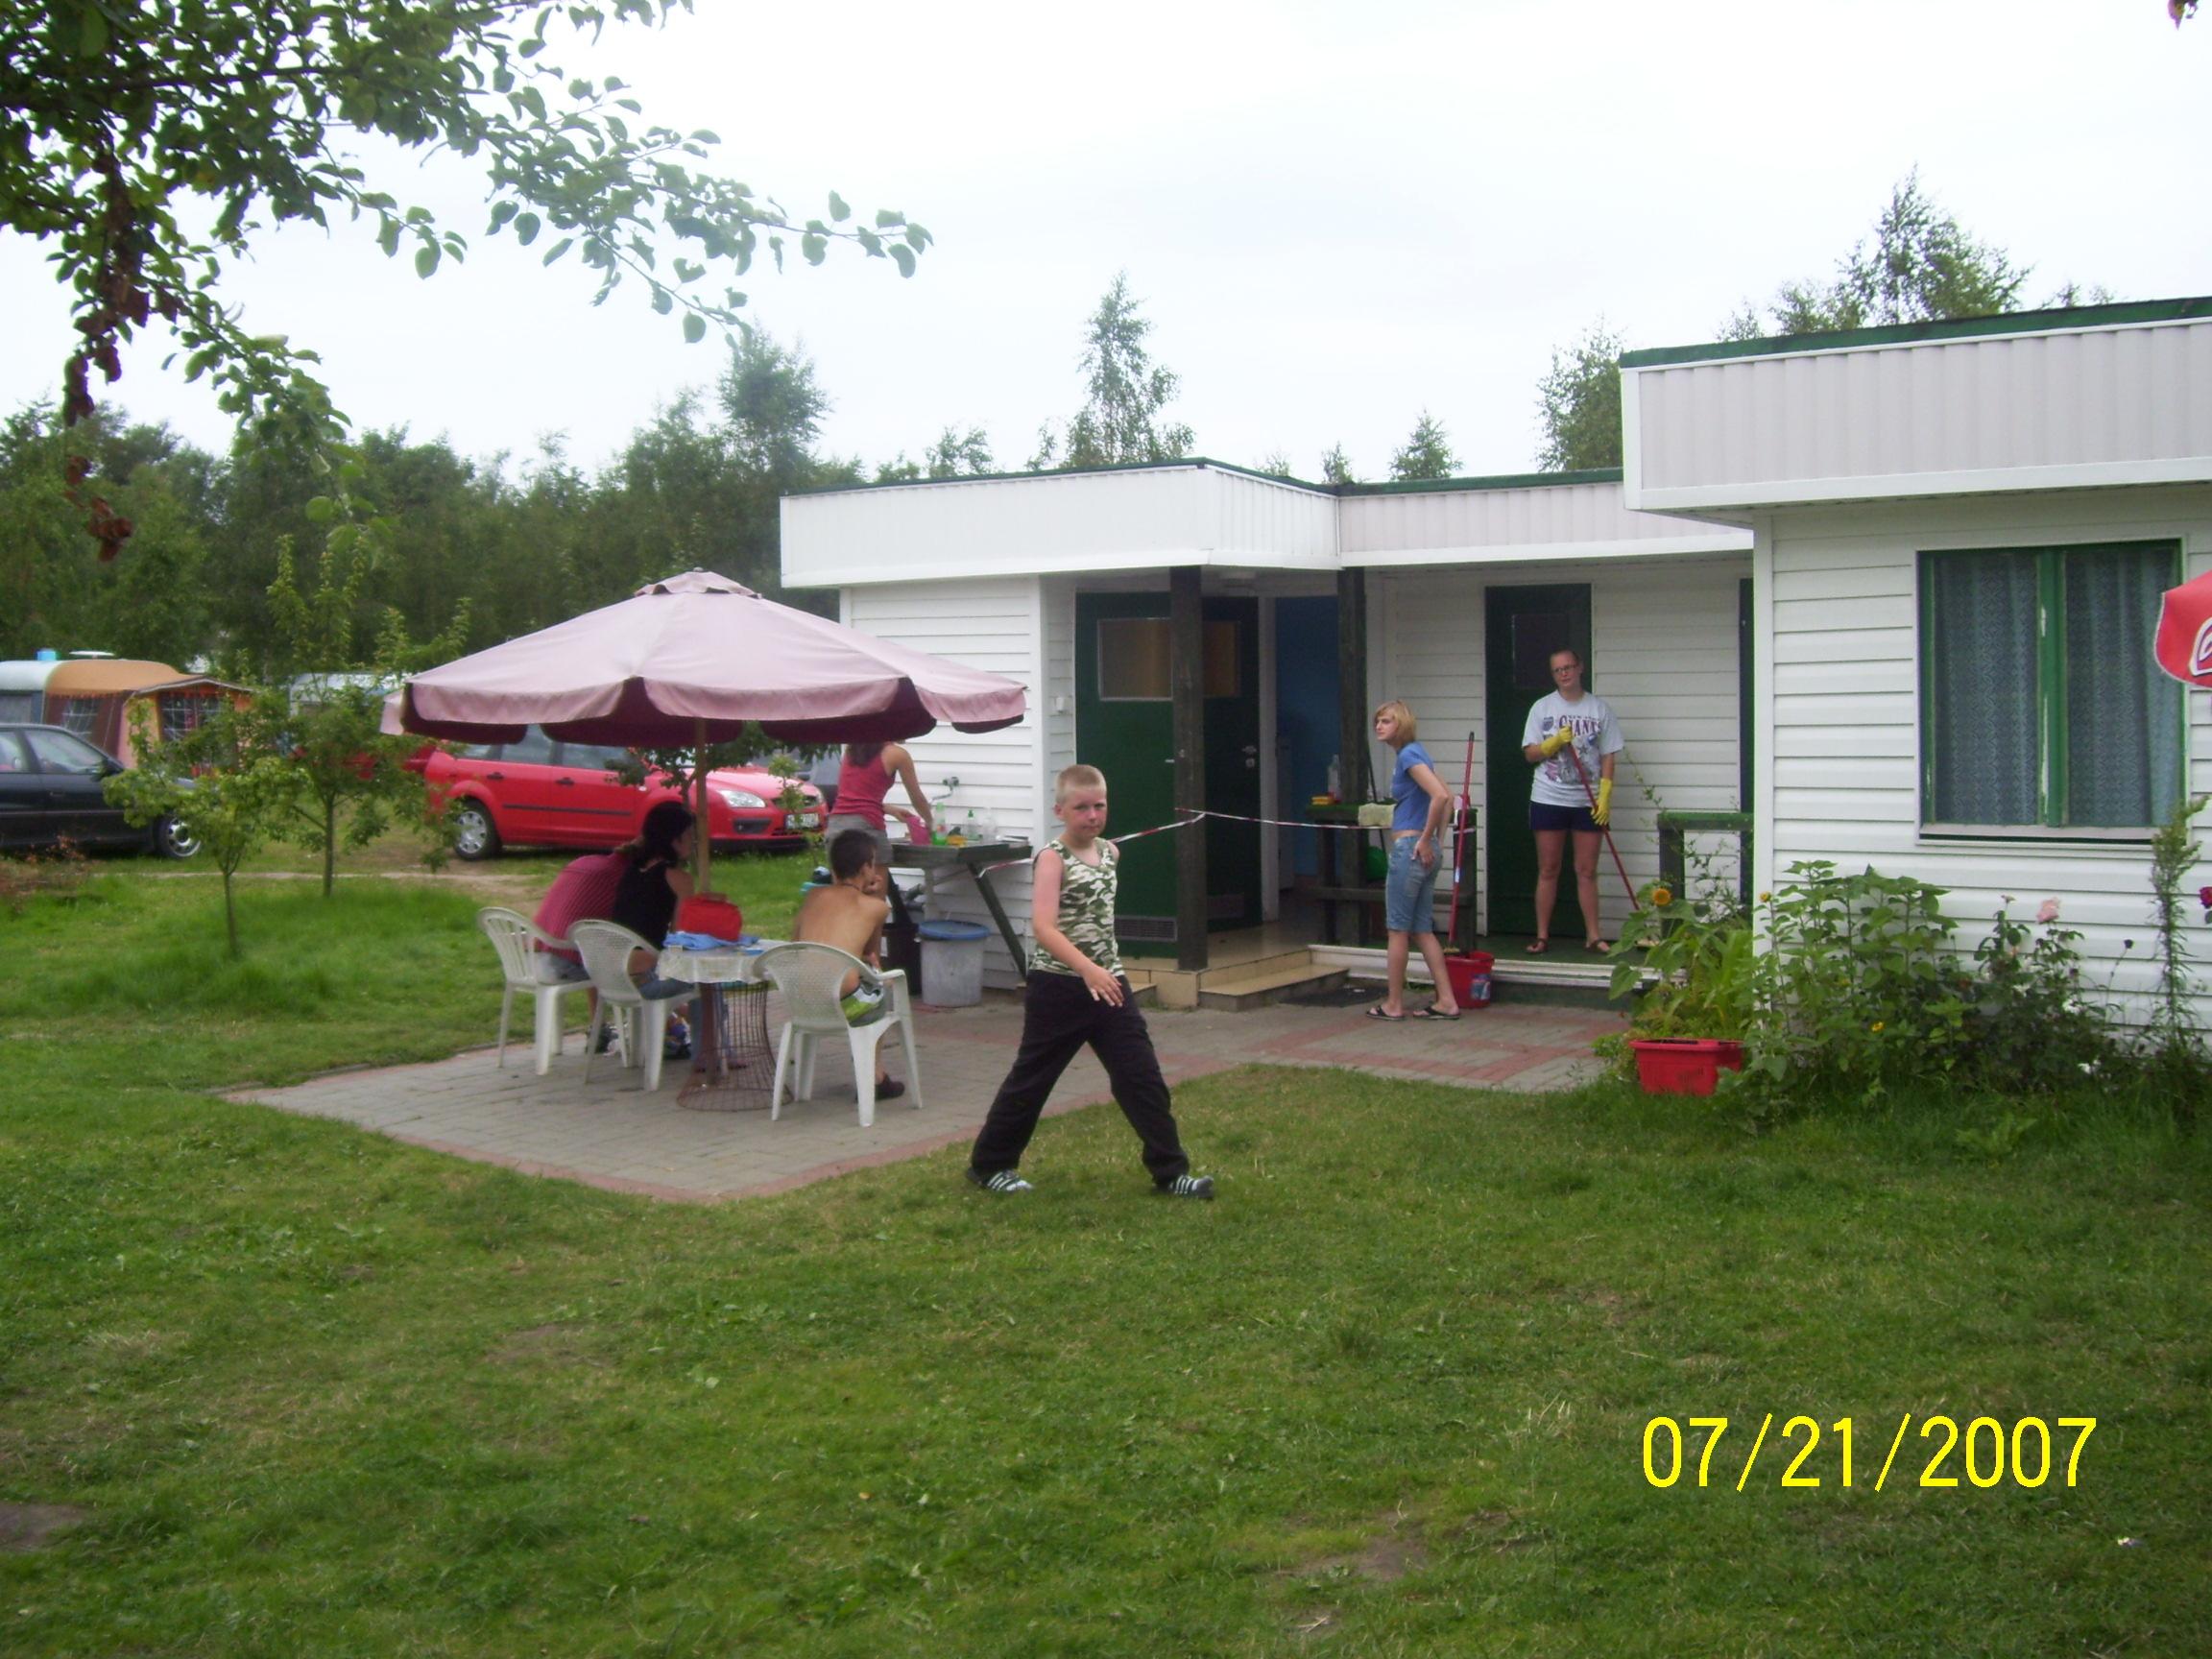 sanitariaty campingu w 2007r